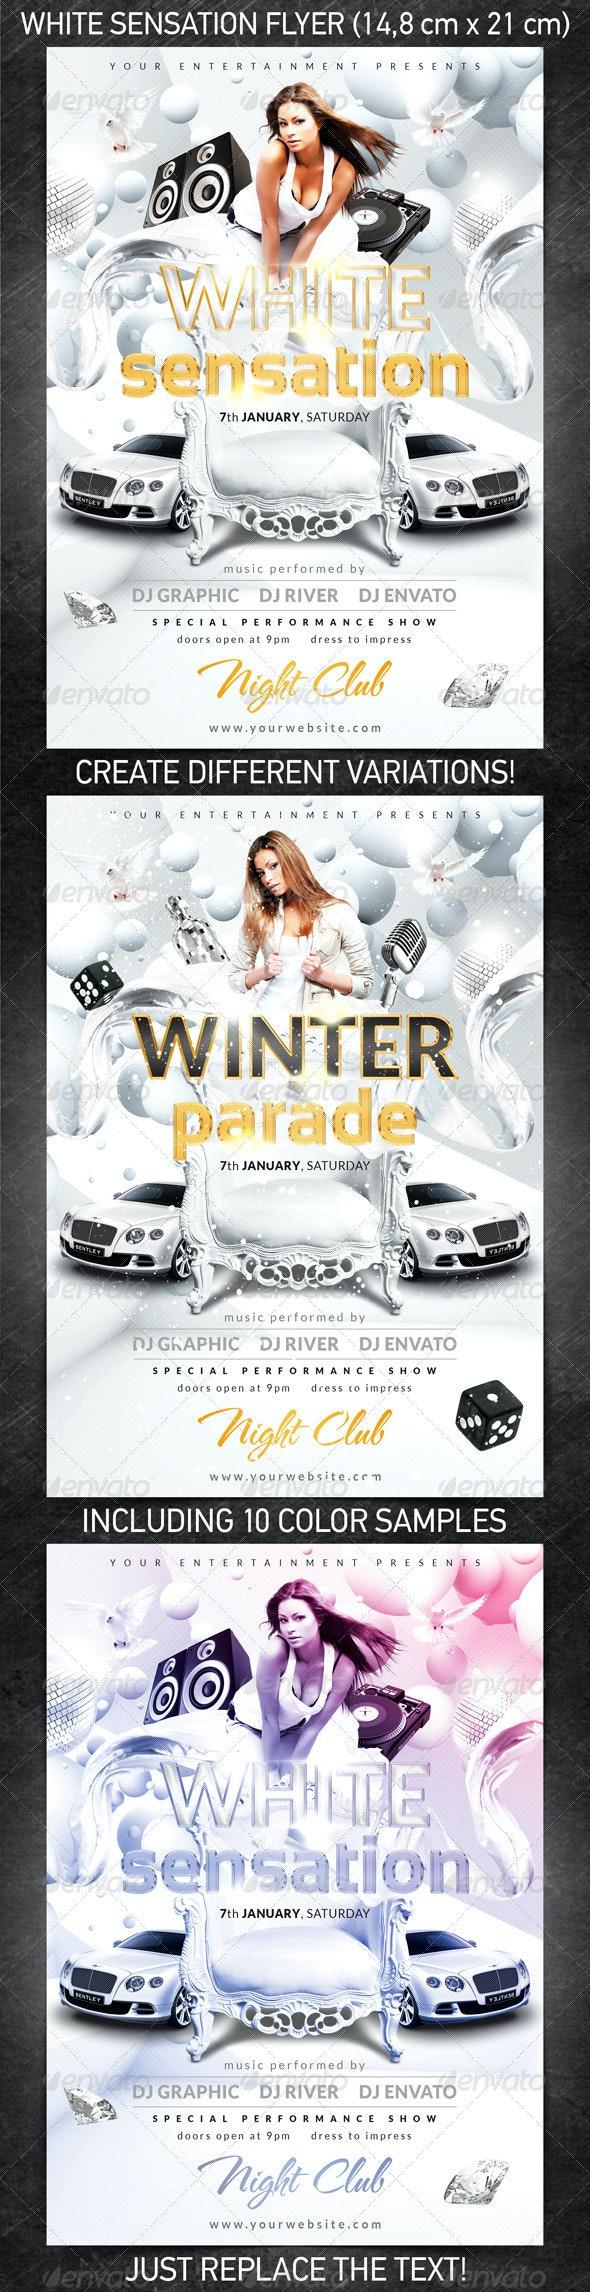 White Sensation Flyer - Clubs & Parties Events